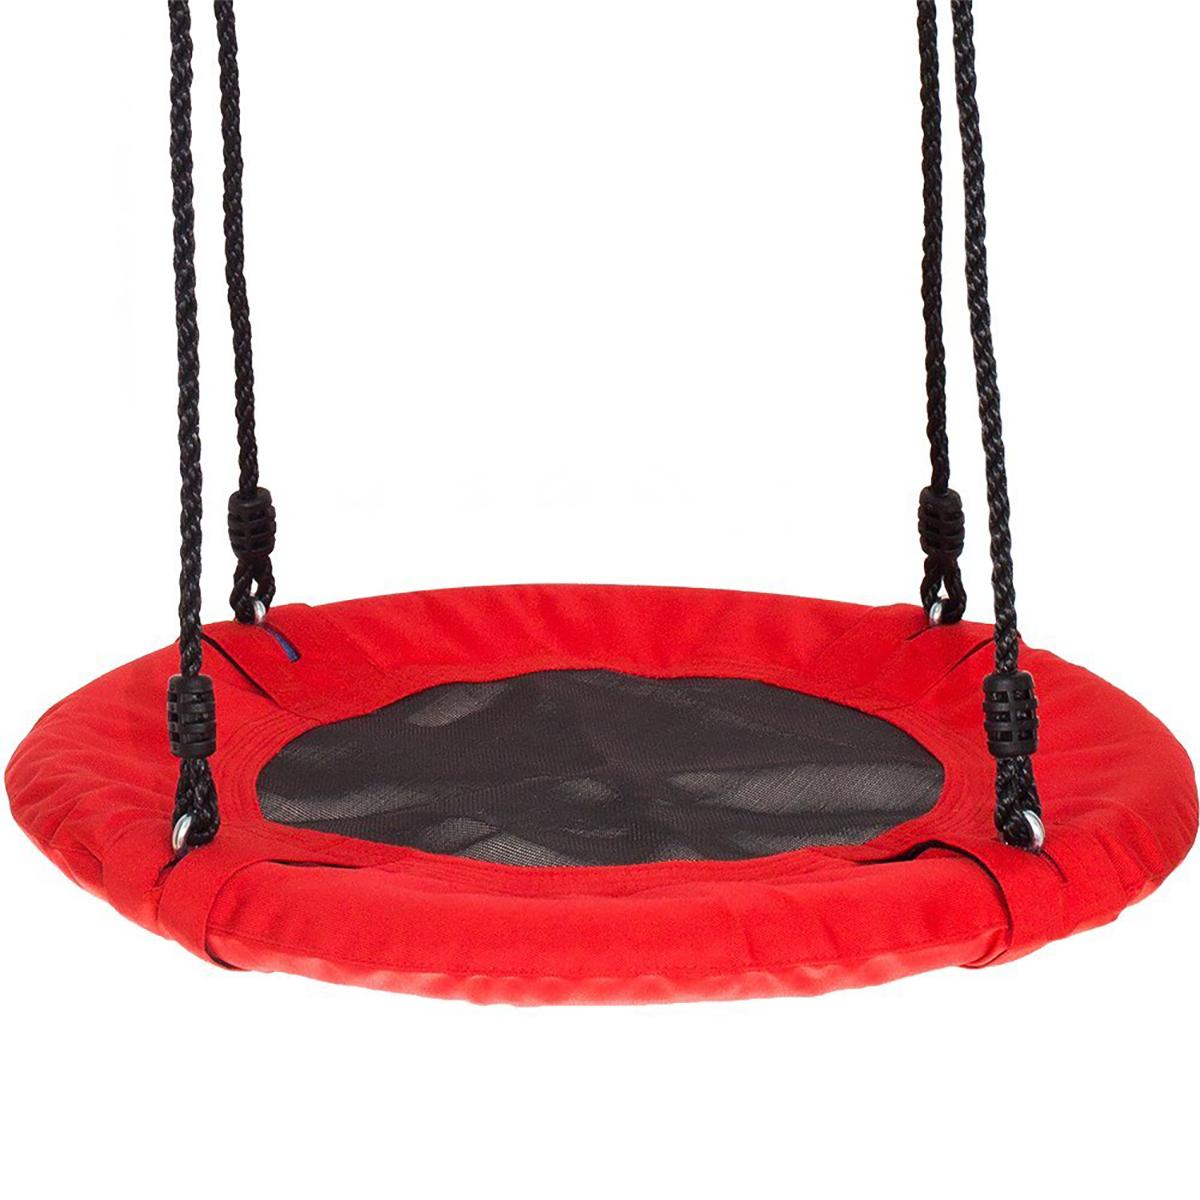 Leagan circular pentru copii King Sport, 103 cm, Rosu imagine